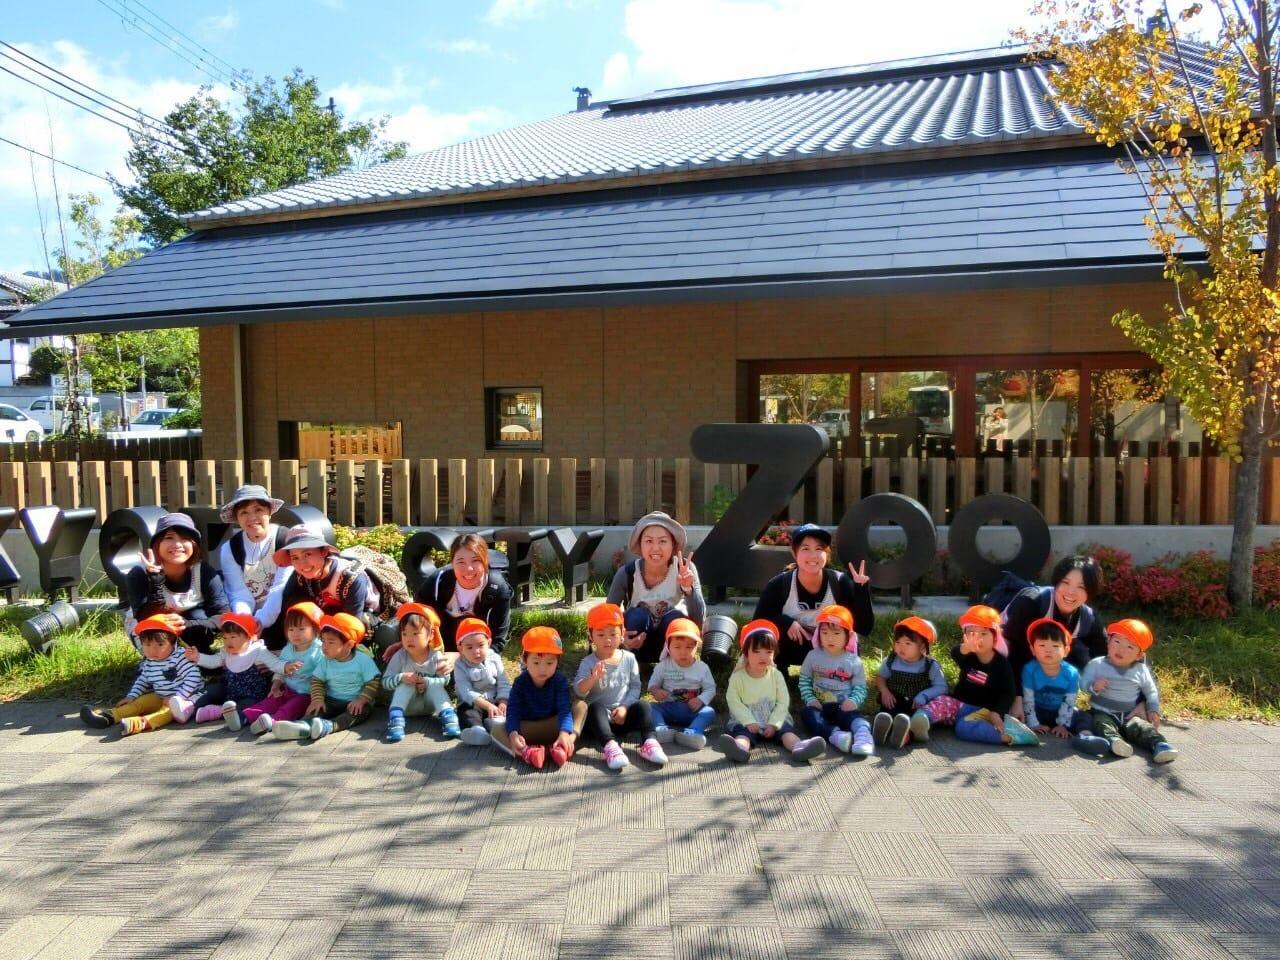 動物園遠足🐘🦁 長岡京園 キャッチ画像